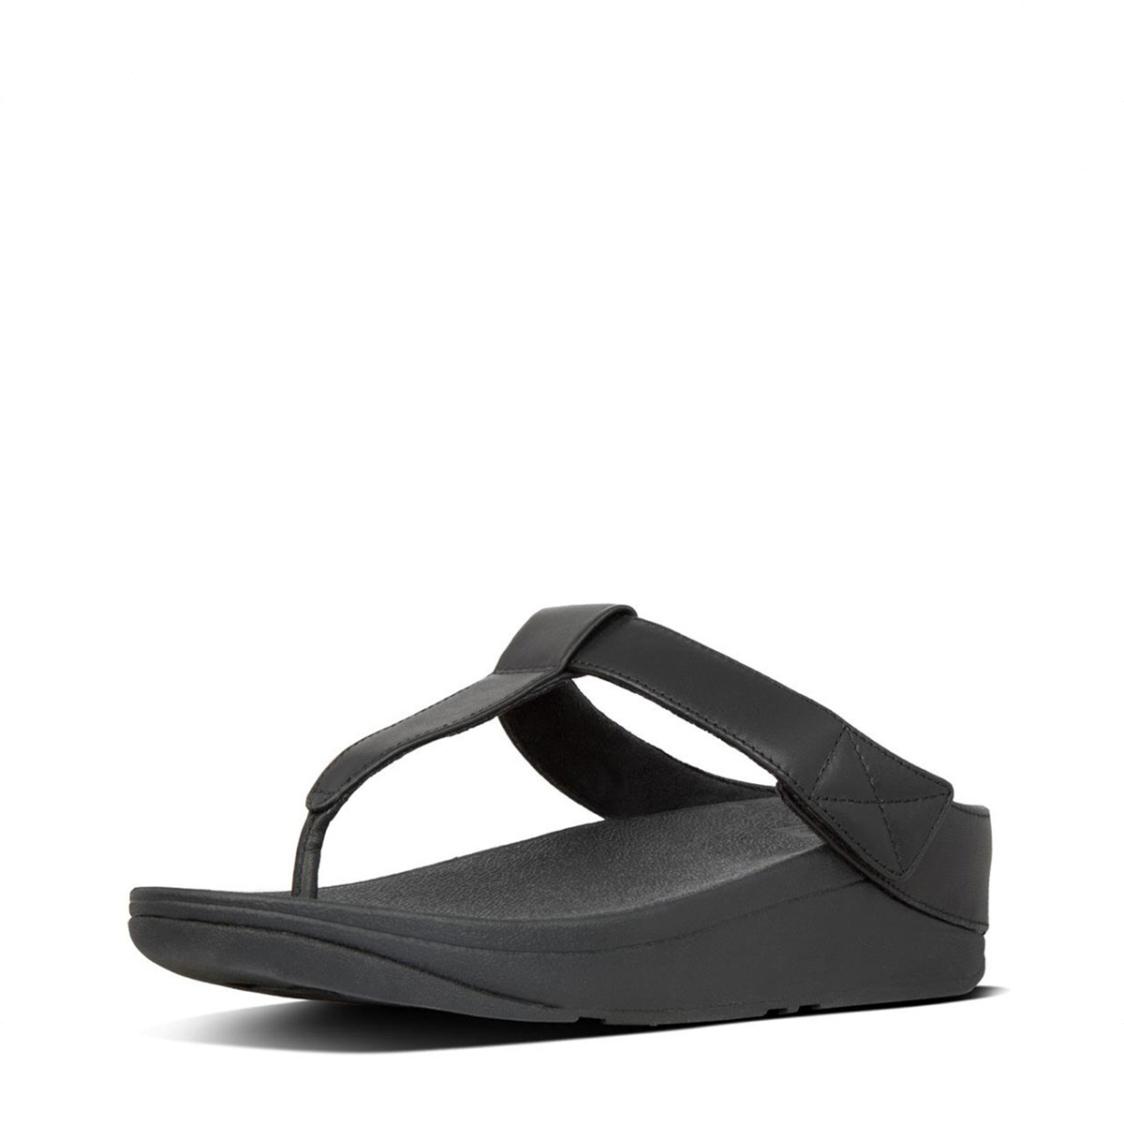 Fitflop Mina Toe Thongs All Black X19-090